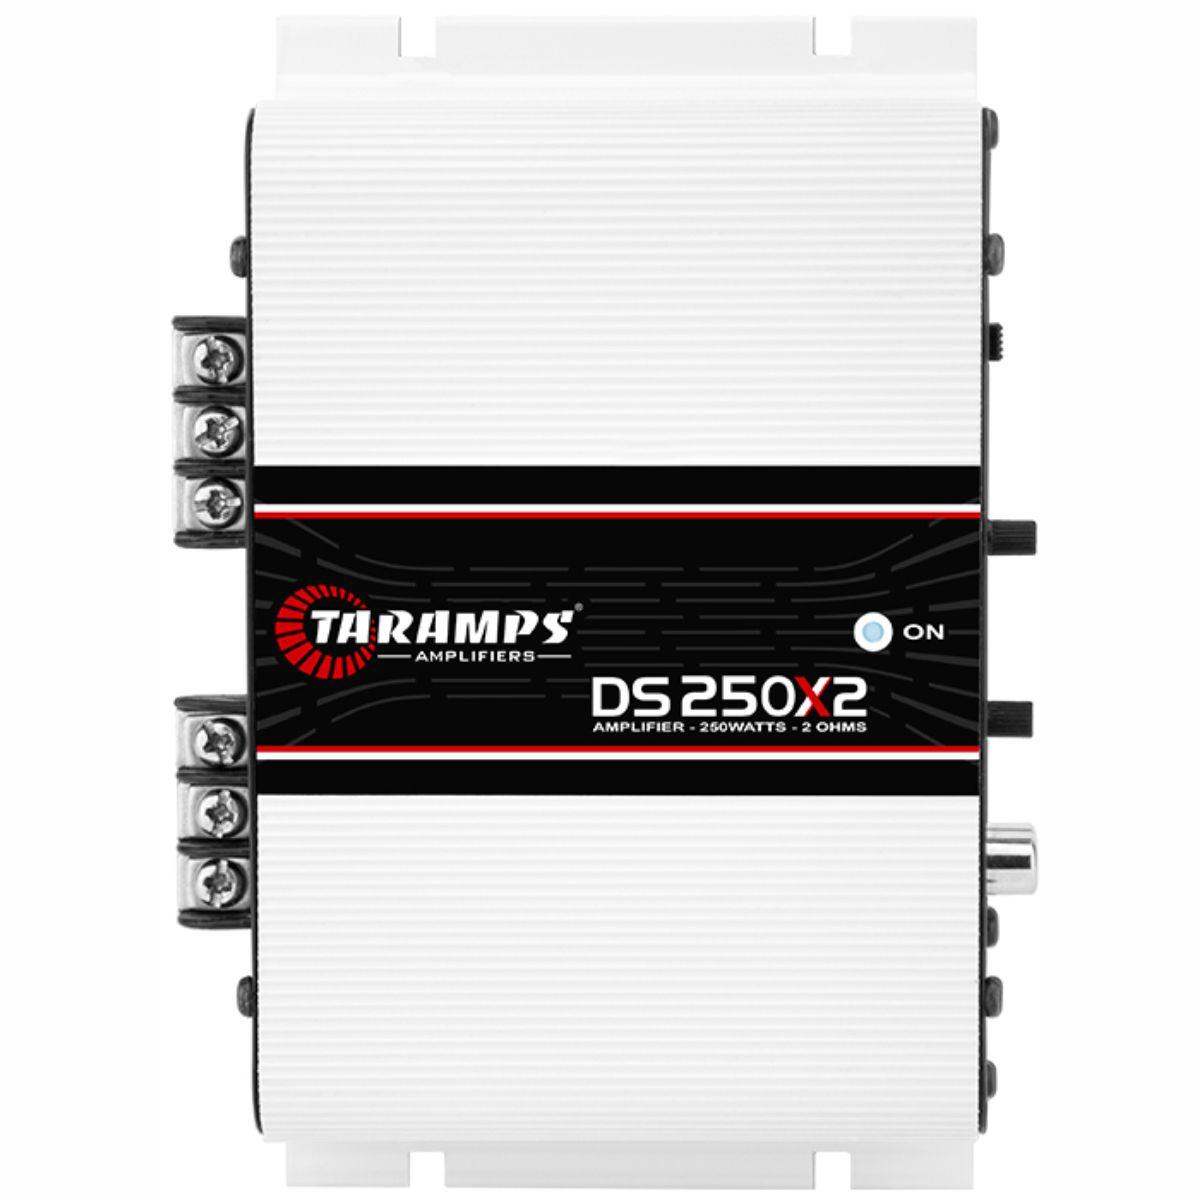 Módulo Amplificador Taramps DS 250X2 250W Rms 2 Ohms 2 Canais